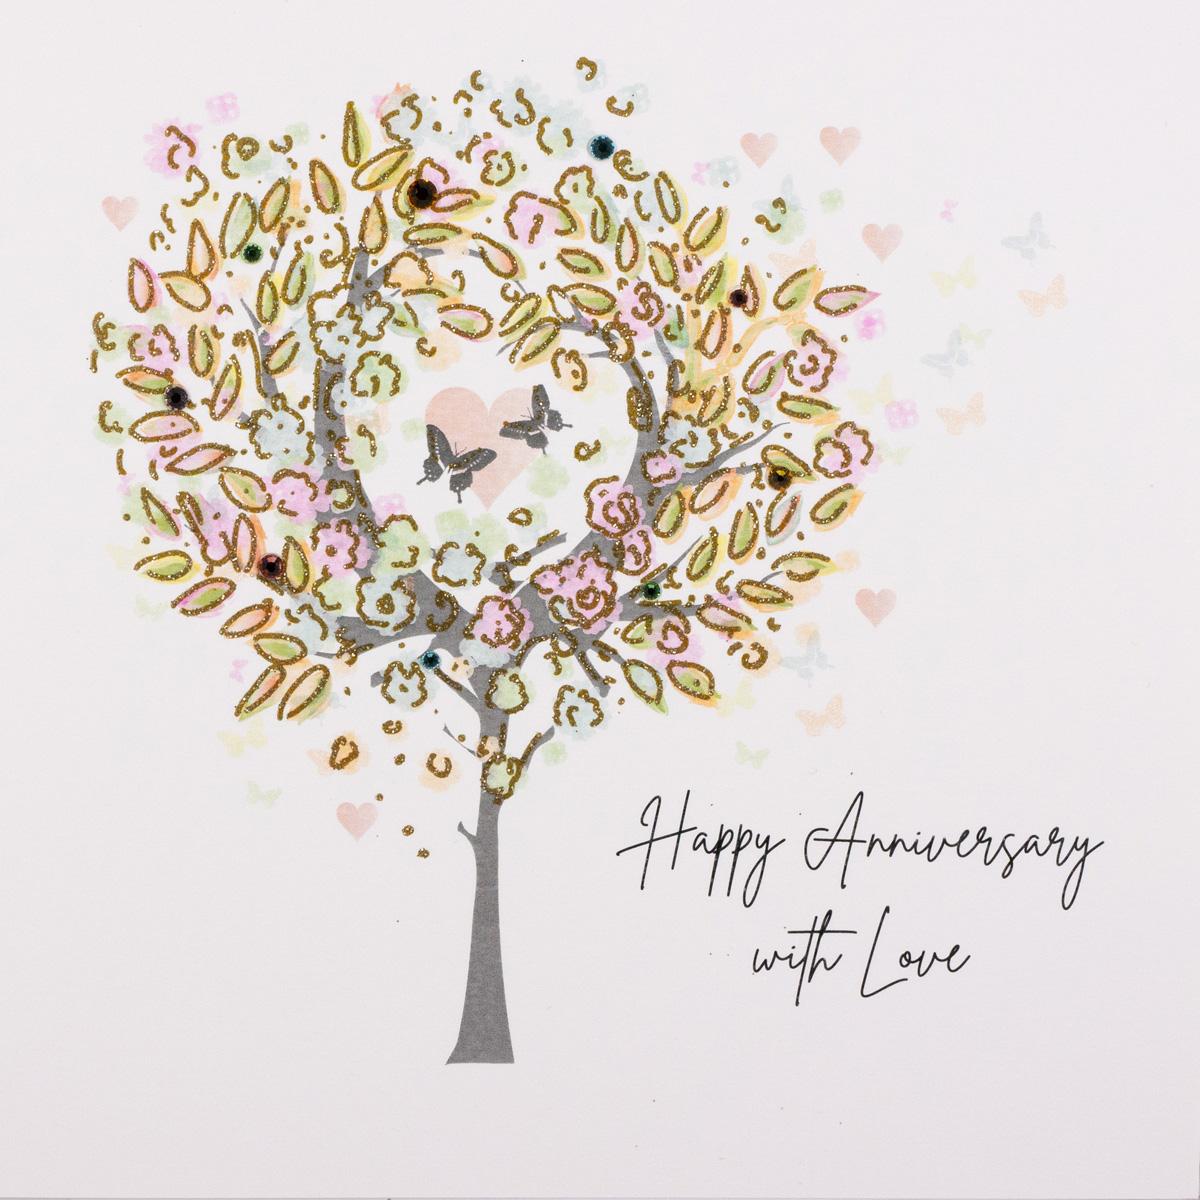 Happy Anniversary With Love